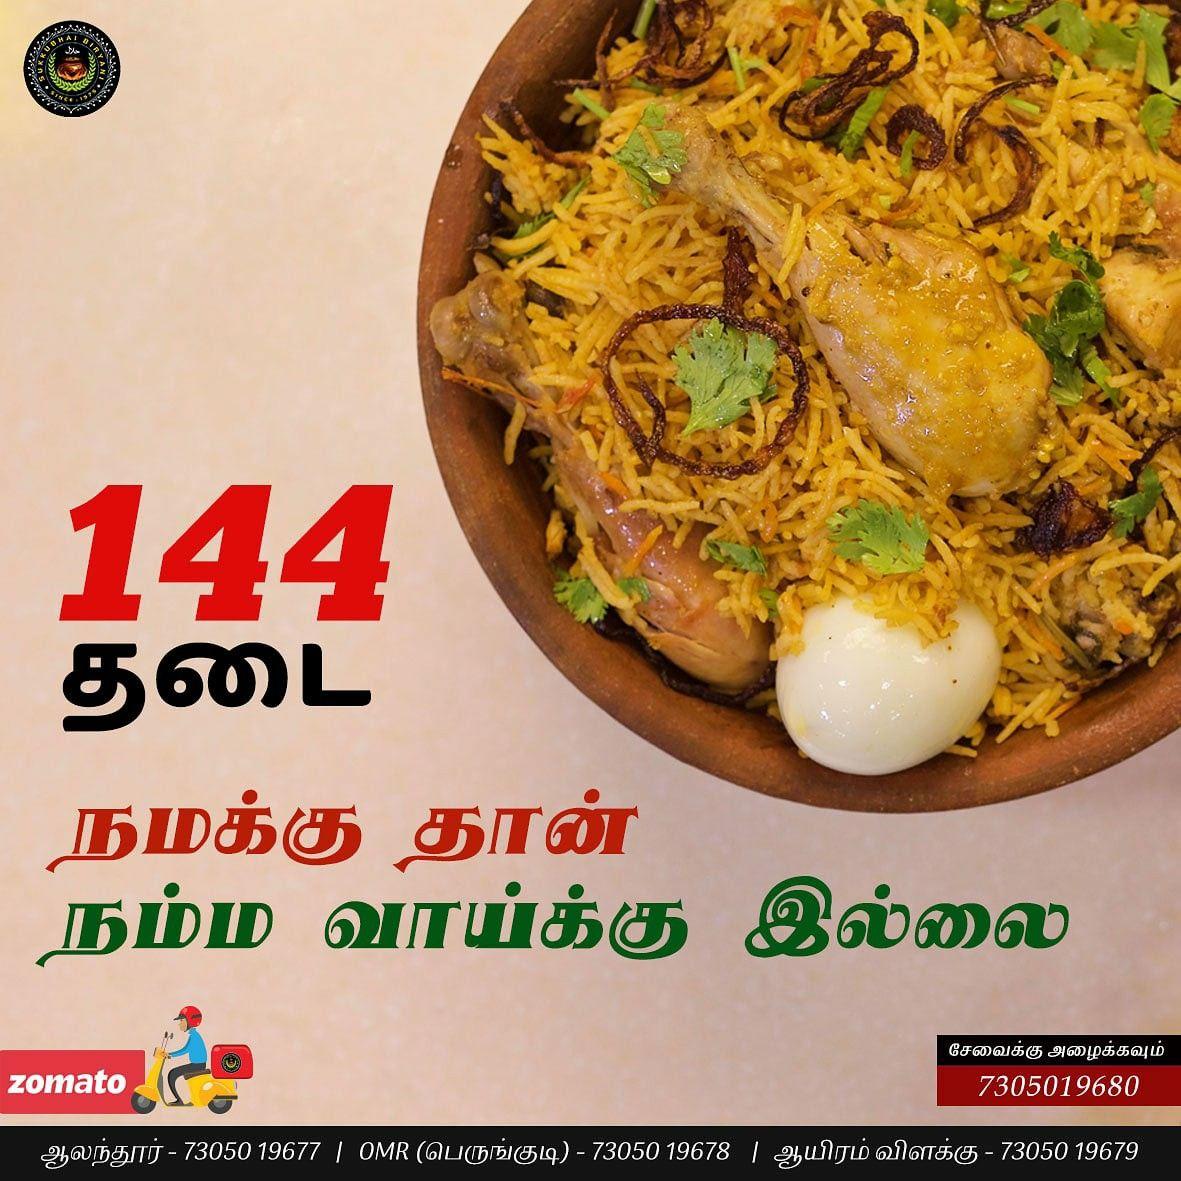 Order Online Sukkubhai Biryani Multicuisine Restaurant In 2020 Biryani Veg Restaurant Signature Dishes